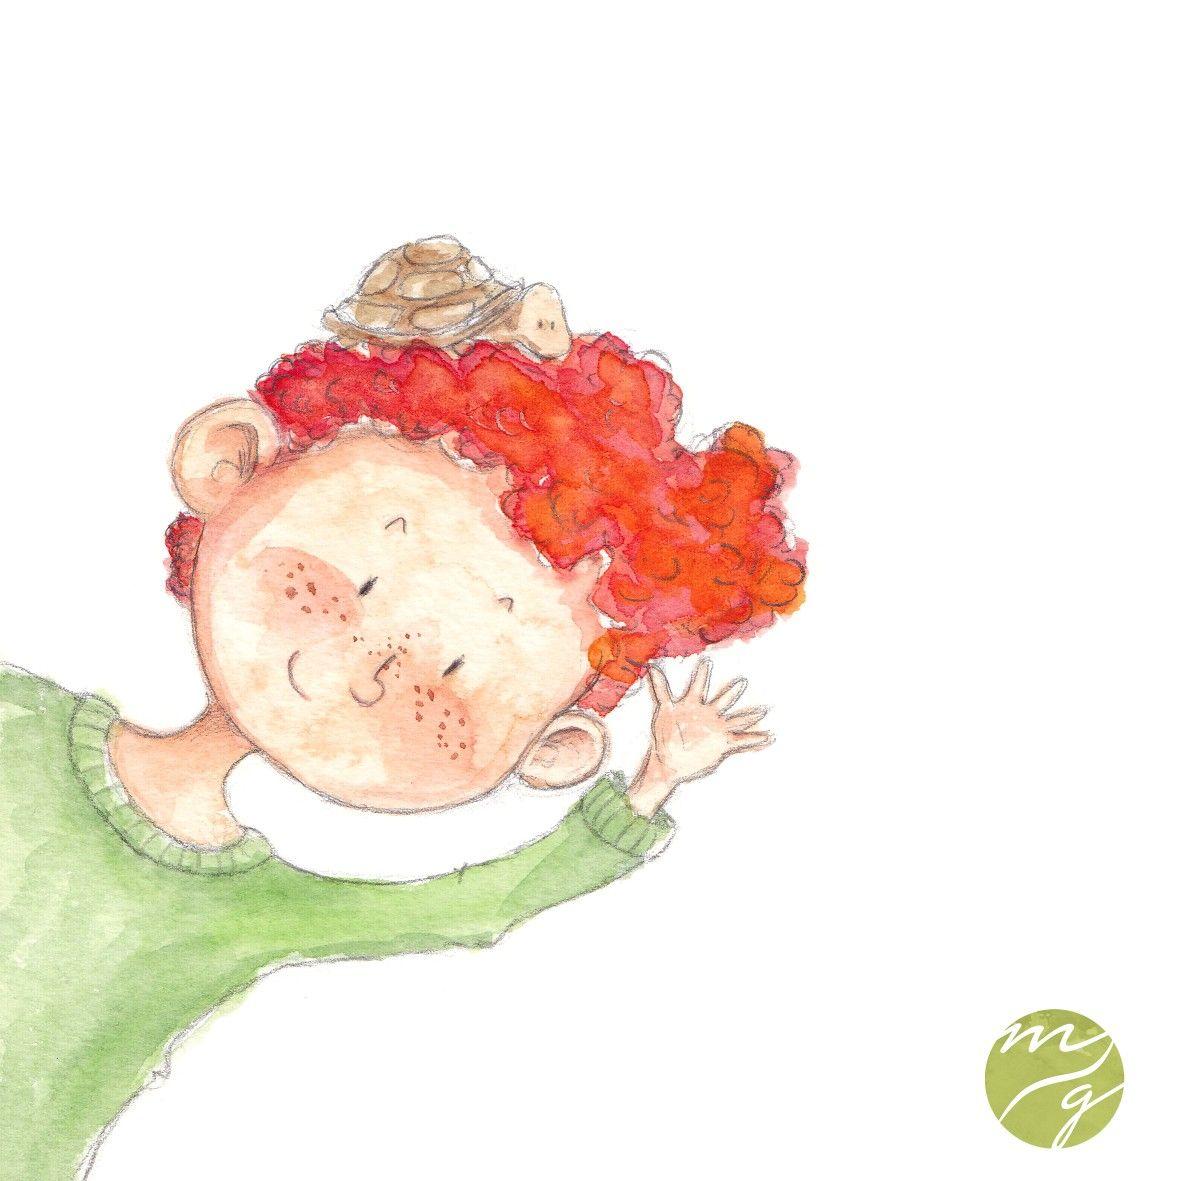 Anton Melanie Gurtler Illustration Aquarell Kinderbuch